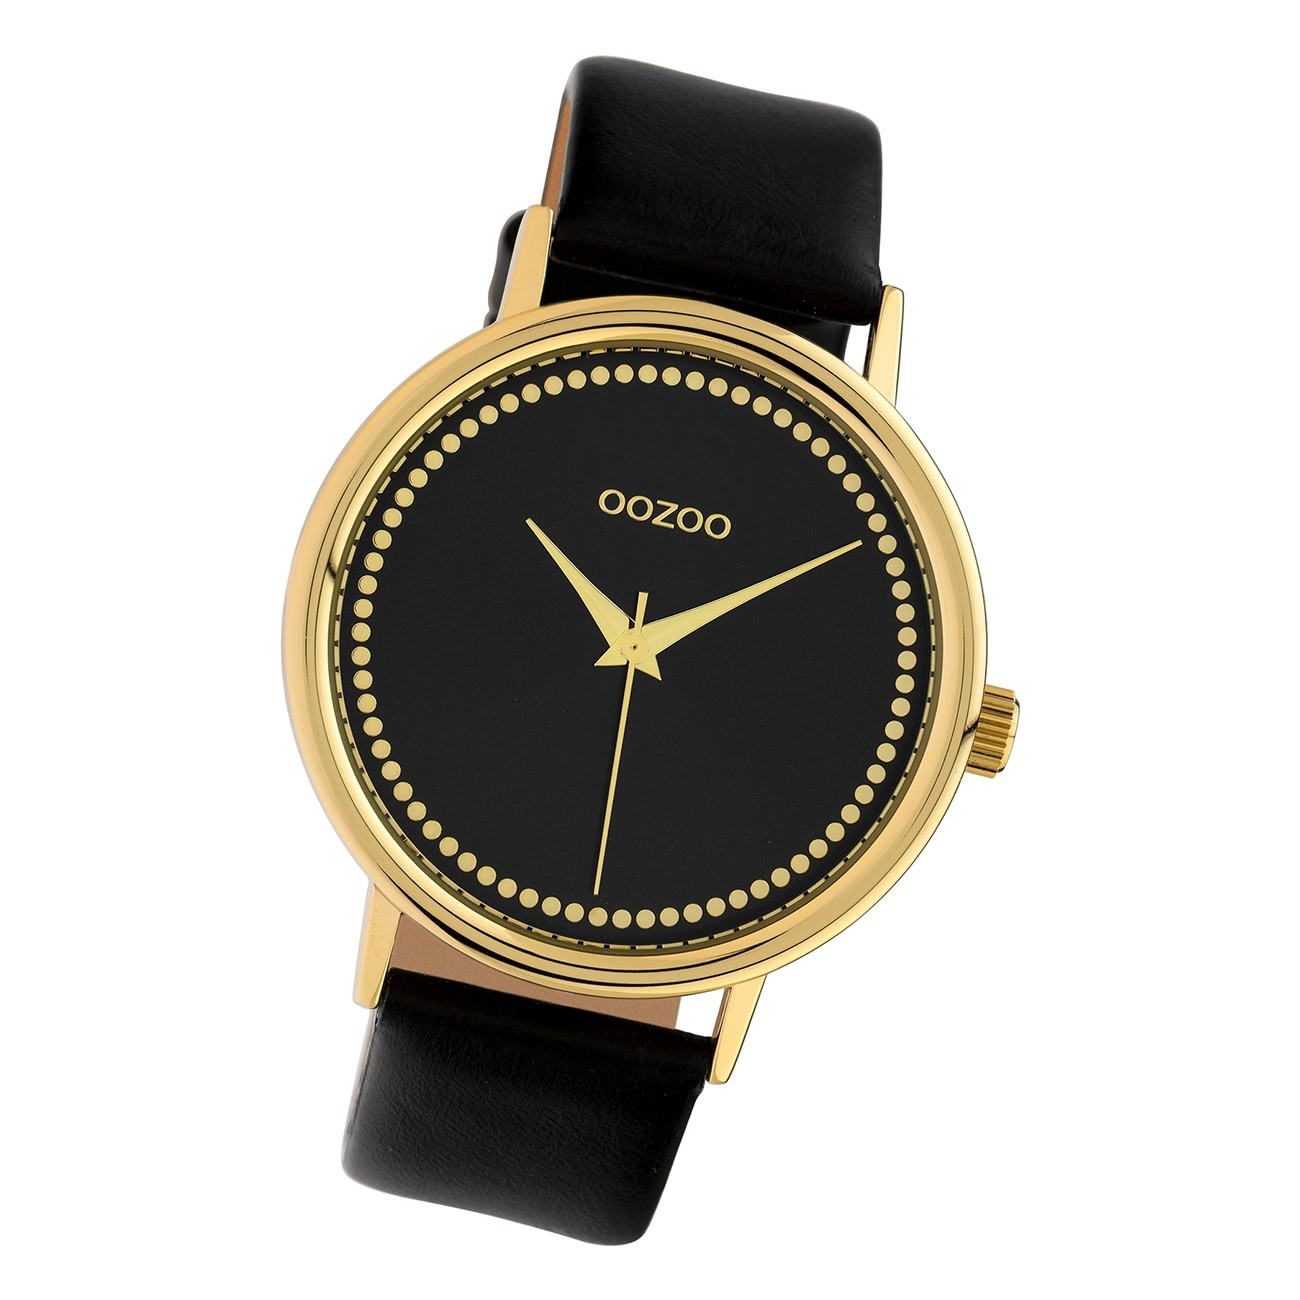 Oozoo Damen Armbanduhr Timepieces C10152 Analog Leder schwarz UOC10152